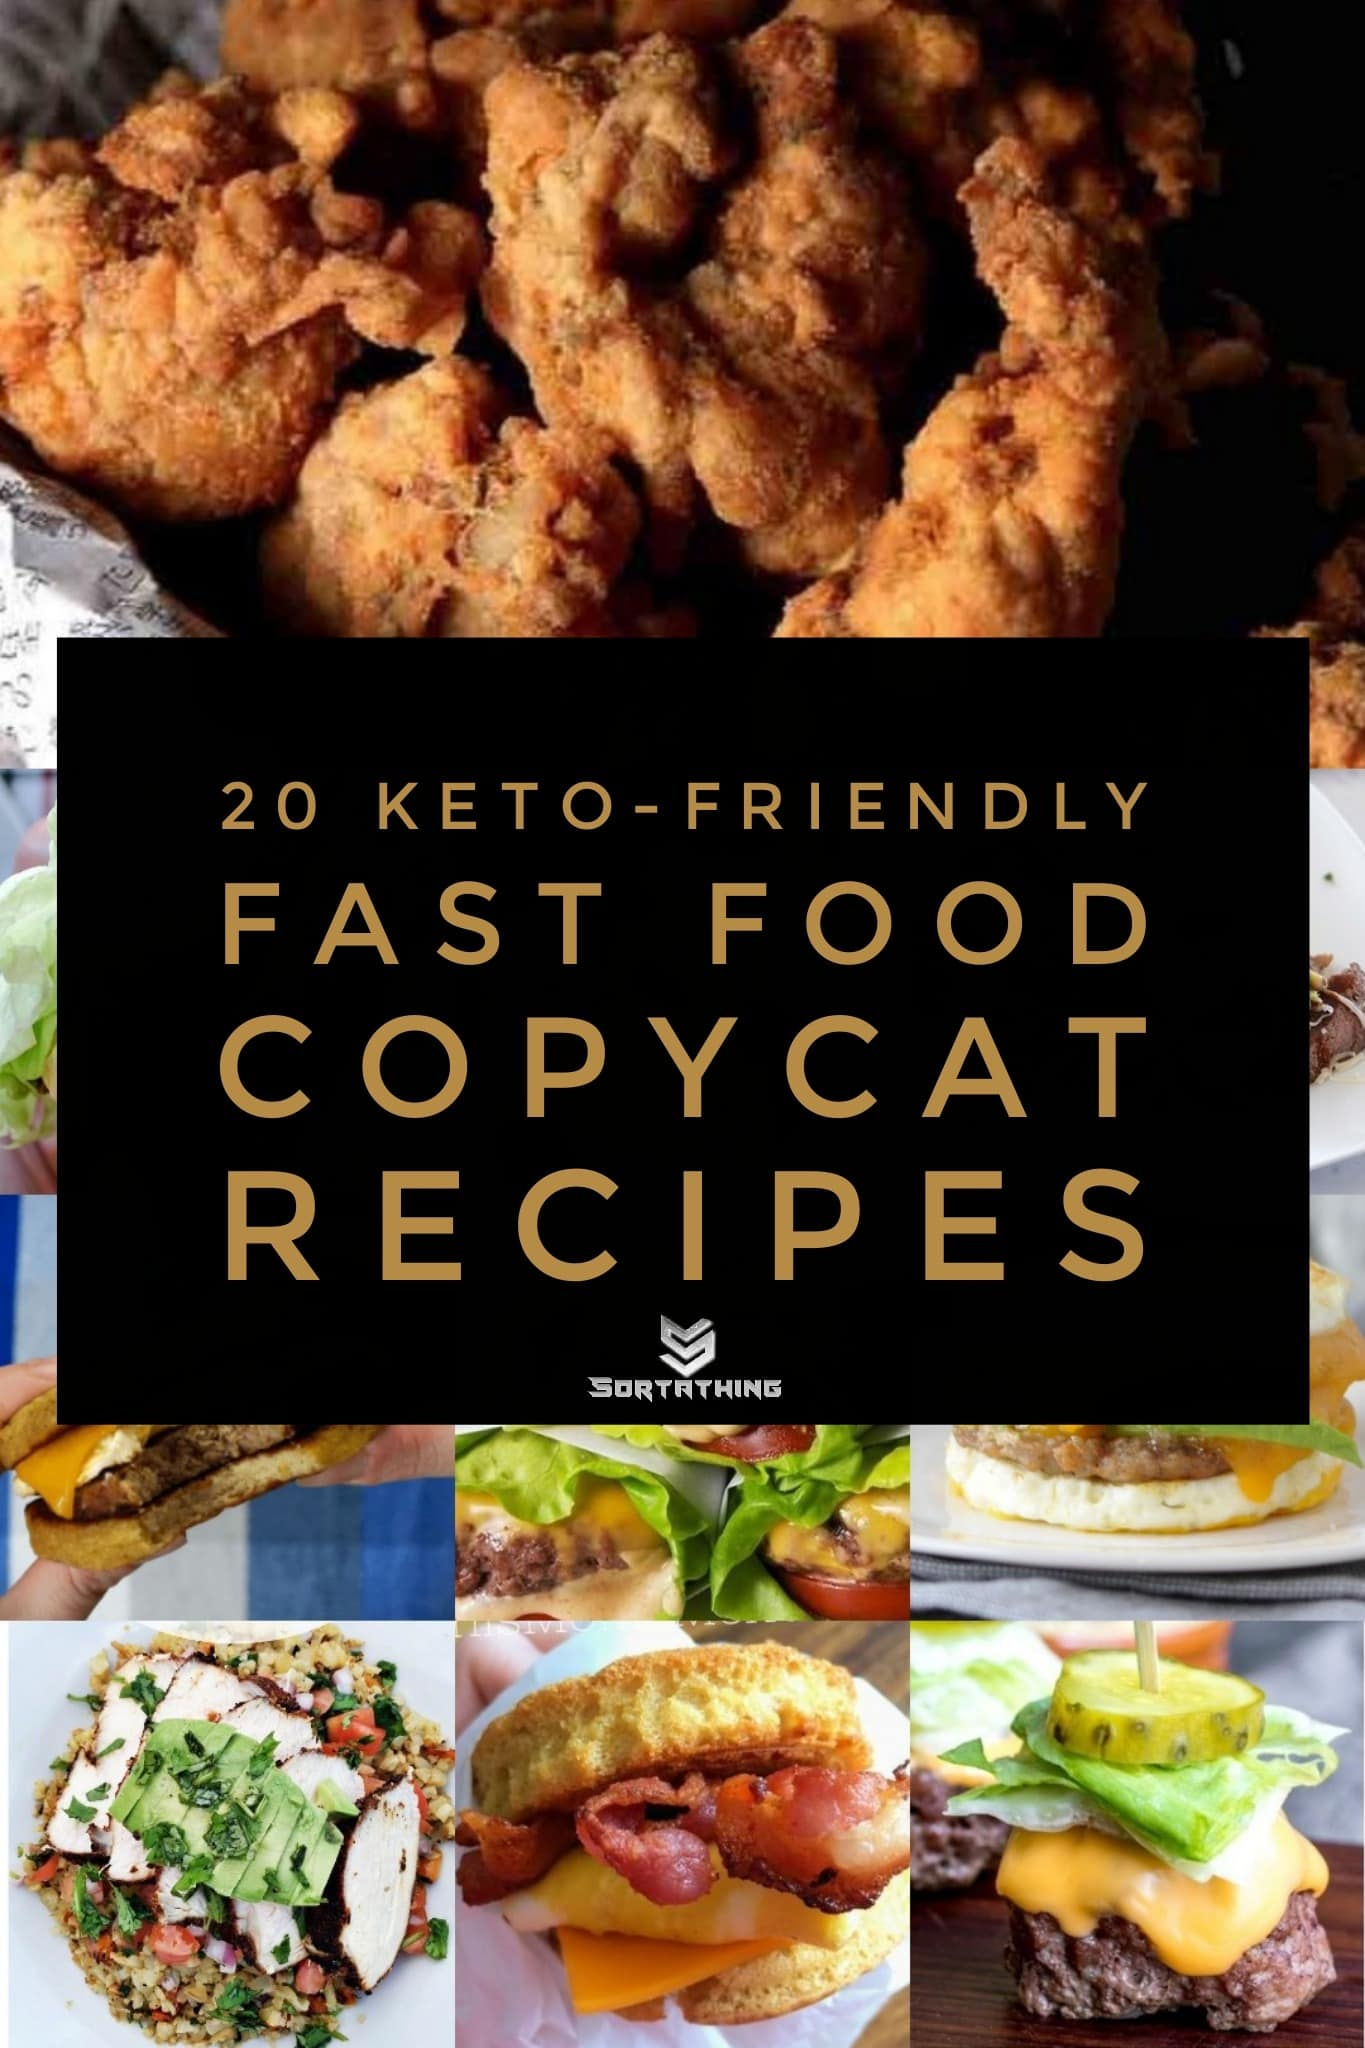 20 Keto-Friendly Fast Food Copycat Recipes